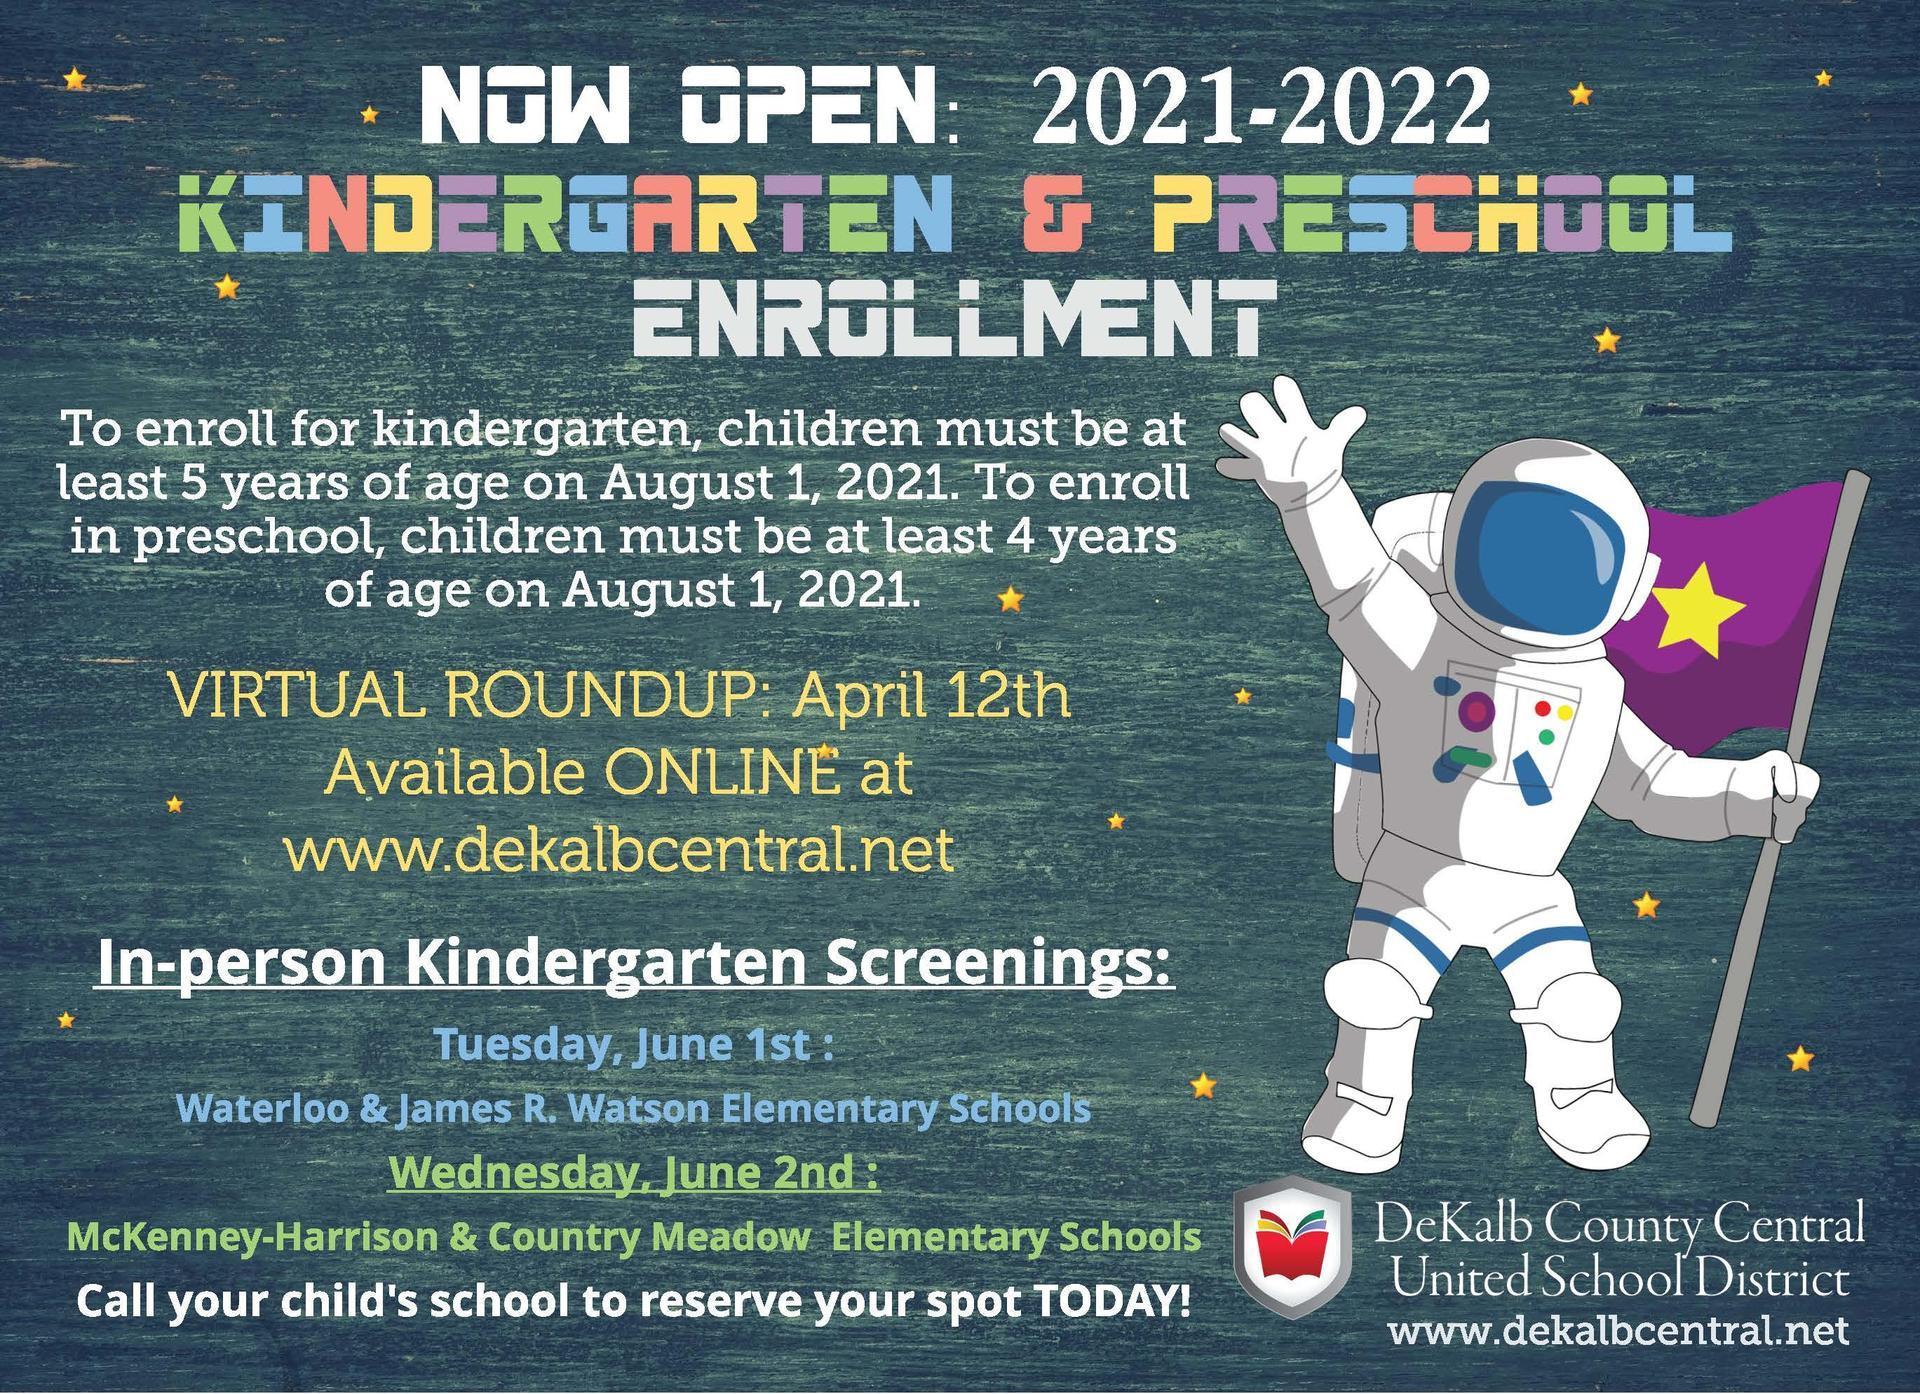 Kindergarten and Preschool Enrollment Information